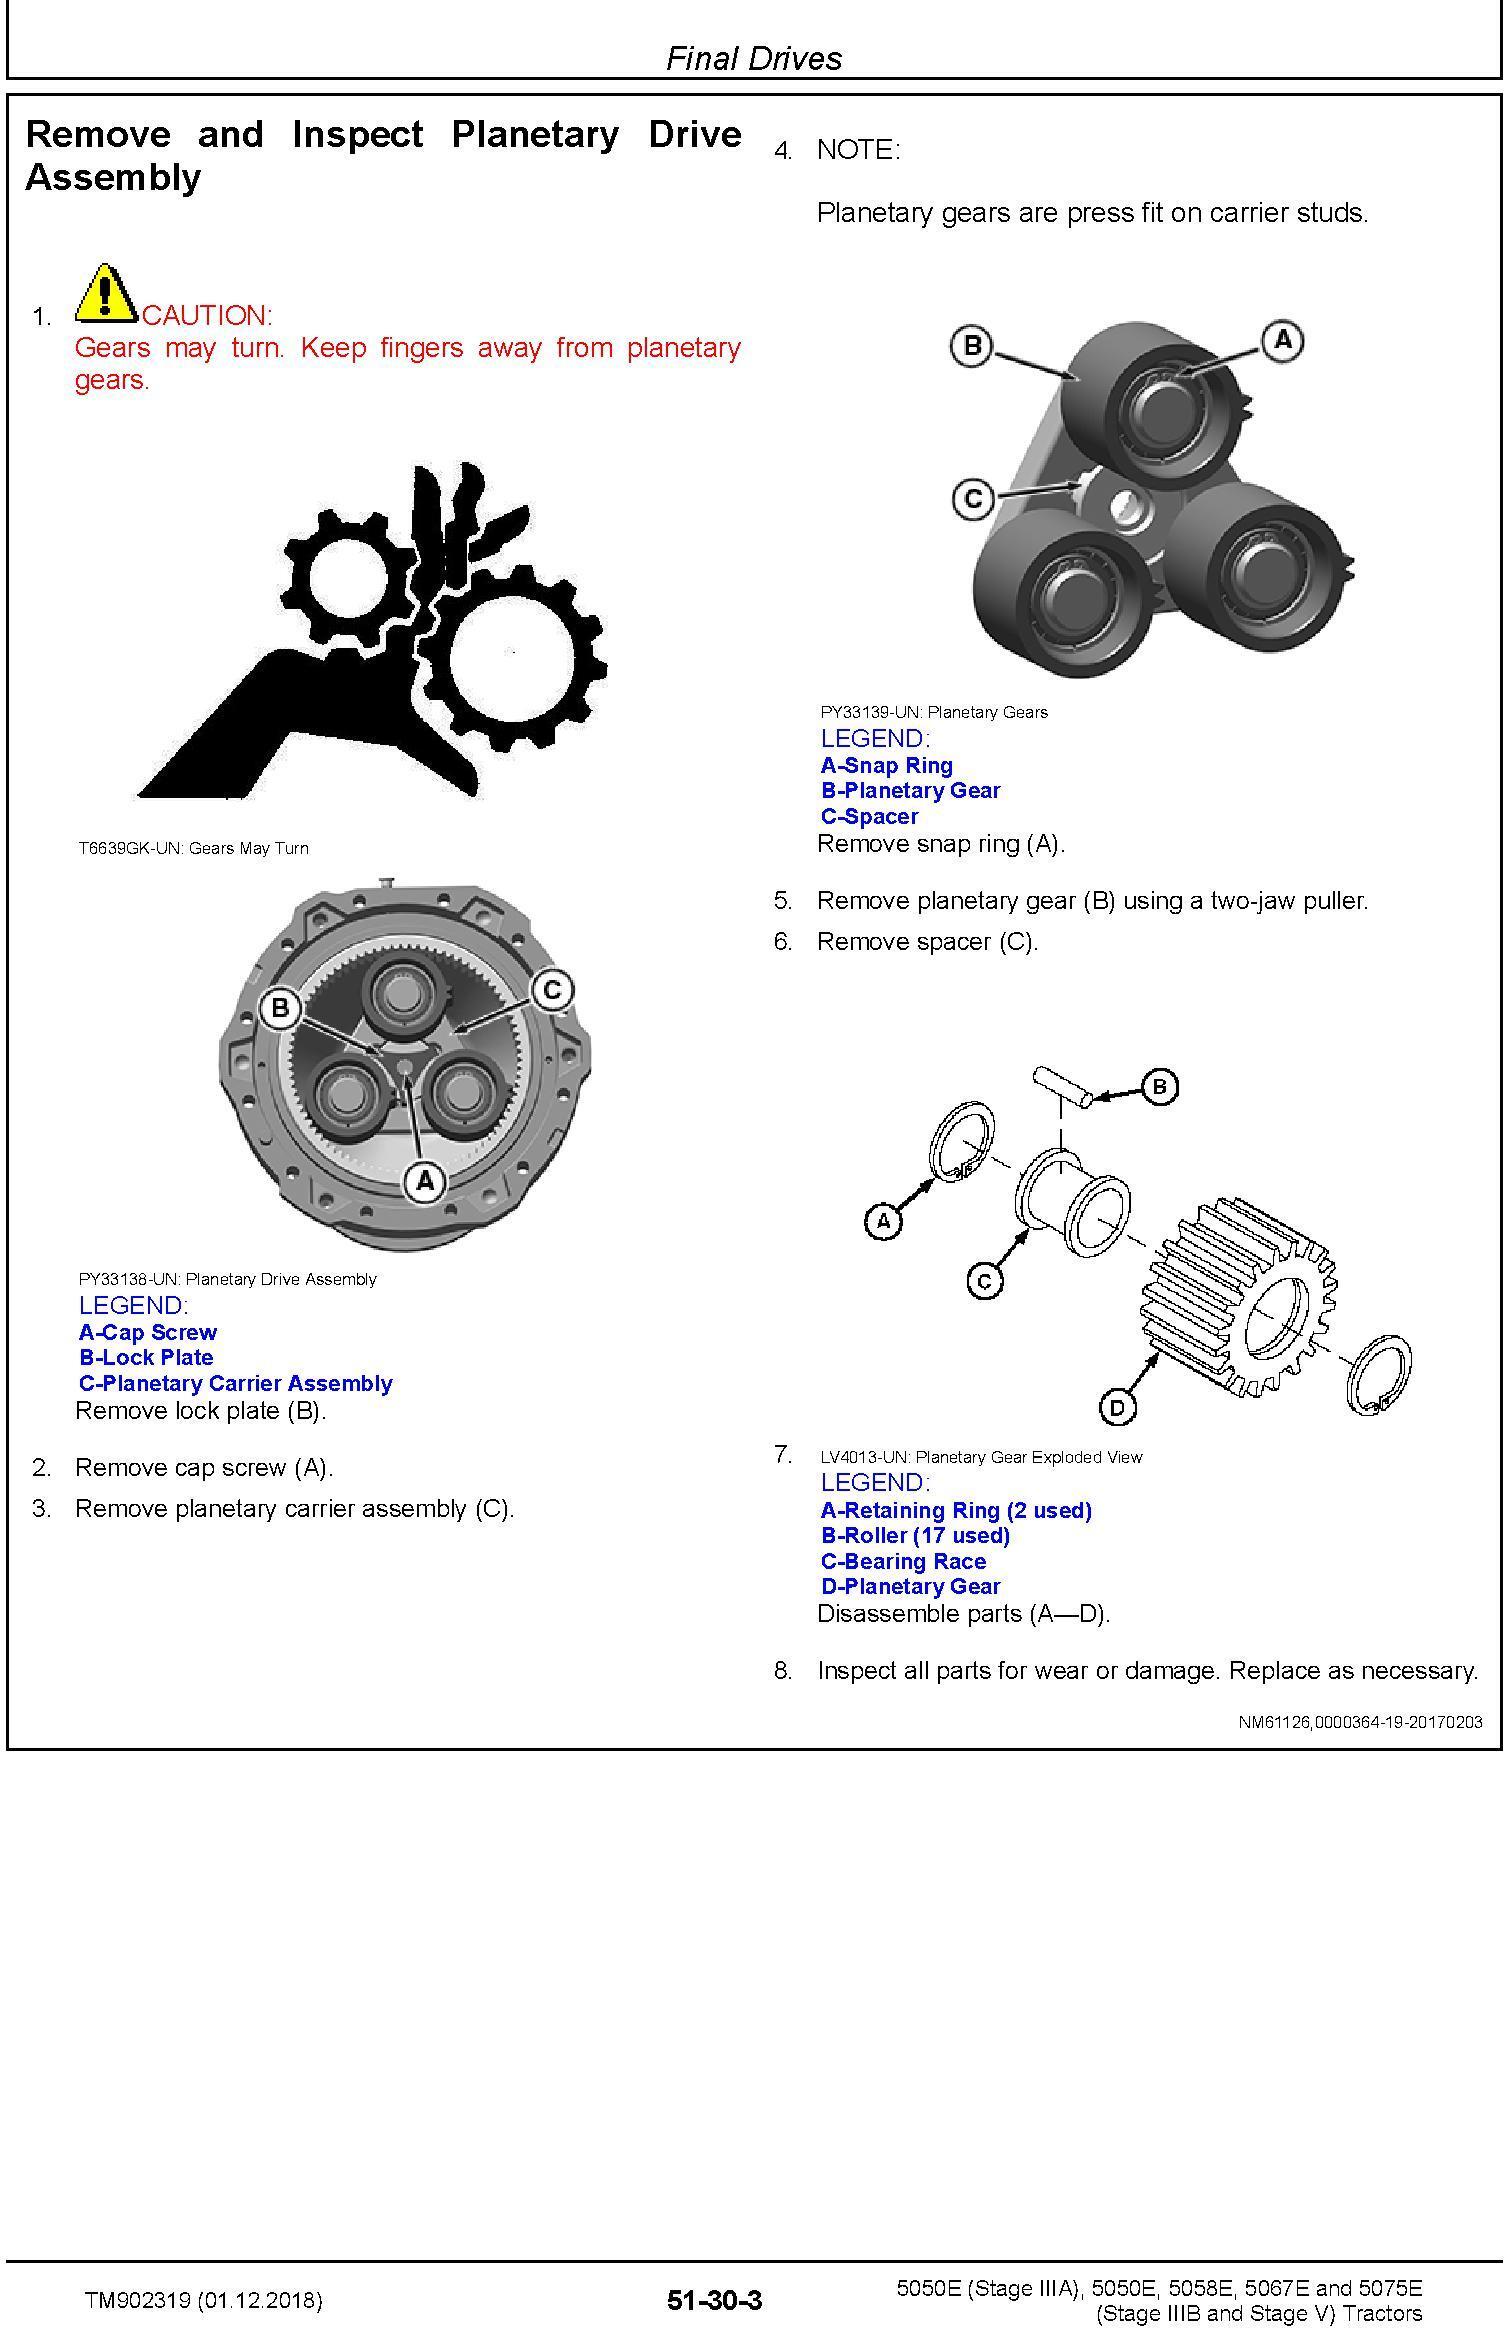 John Deere 5050E, 5050E, 5058E, 5067E, 5075E Tractors Service Repair Technical Manual (TM902319) - 2